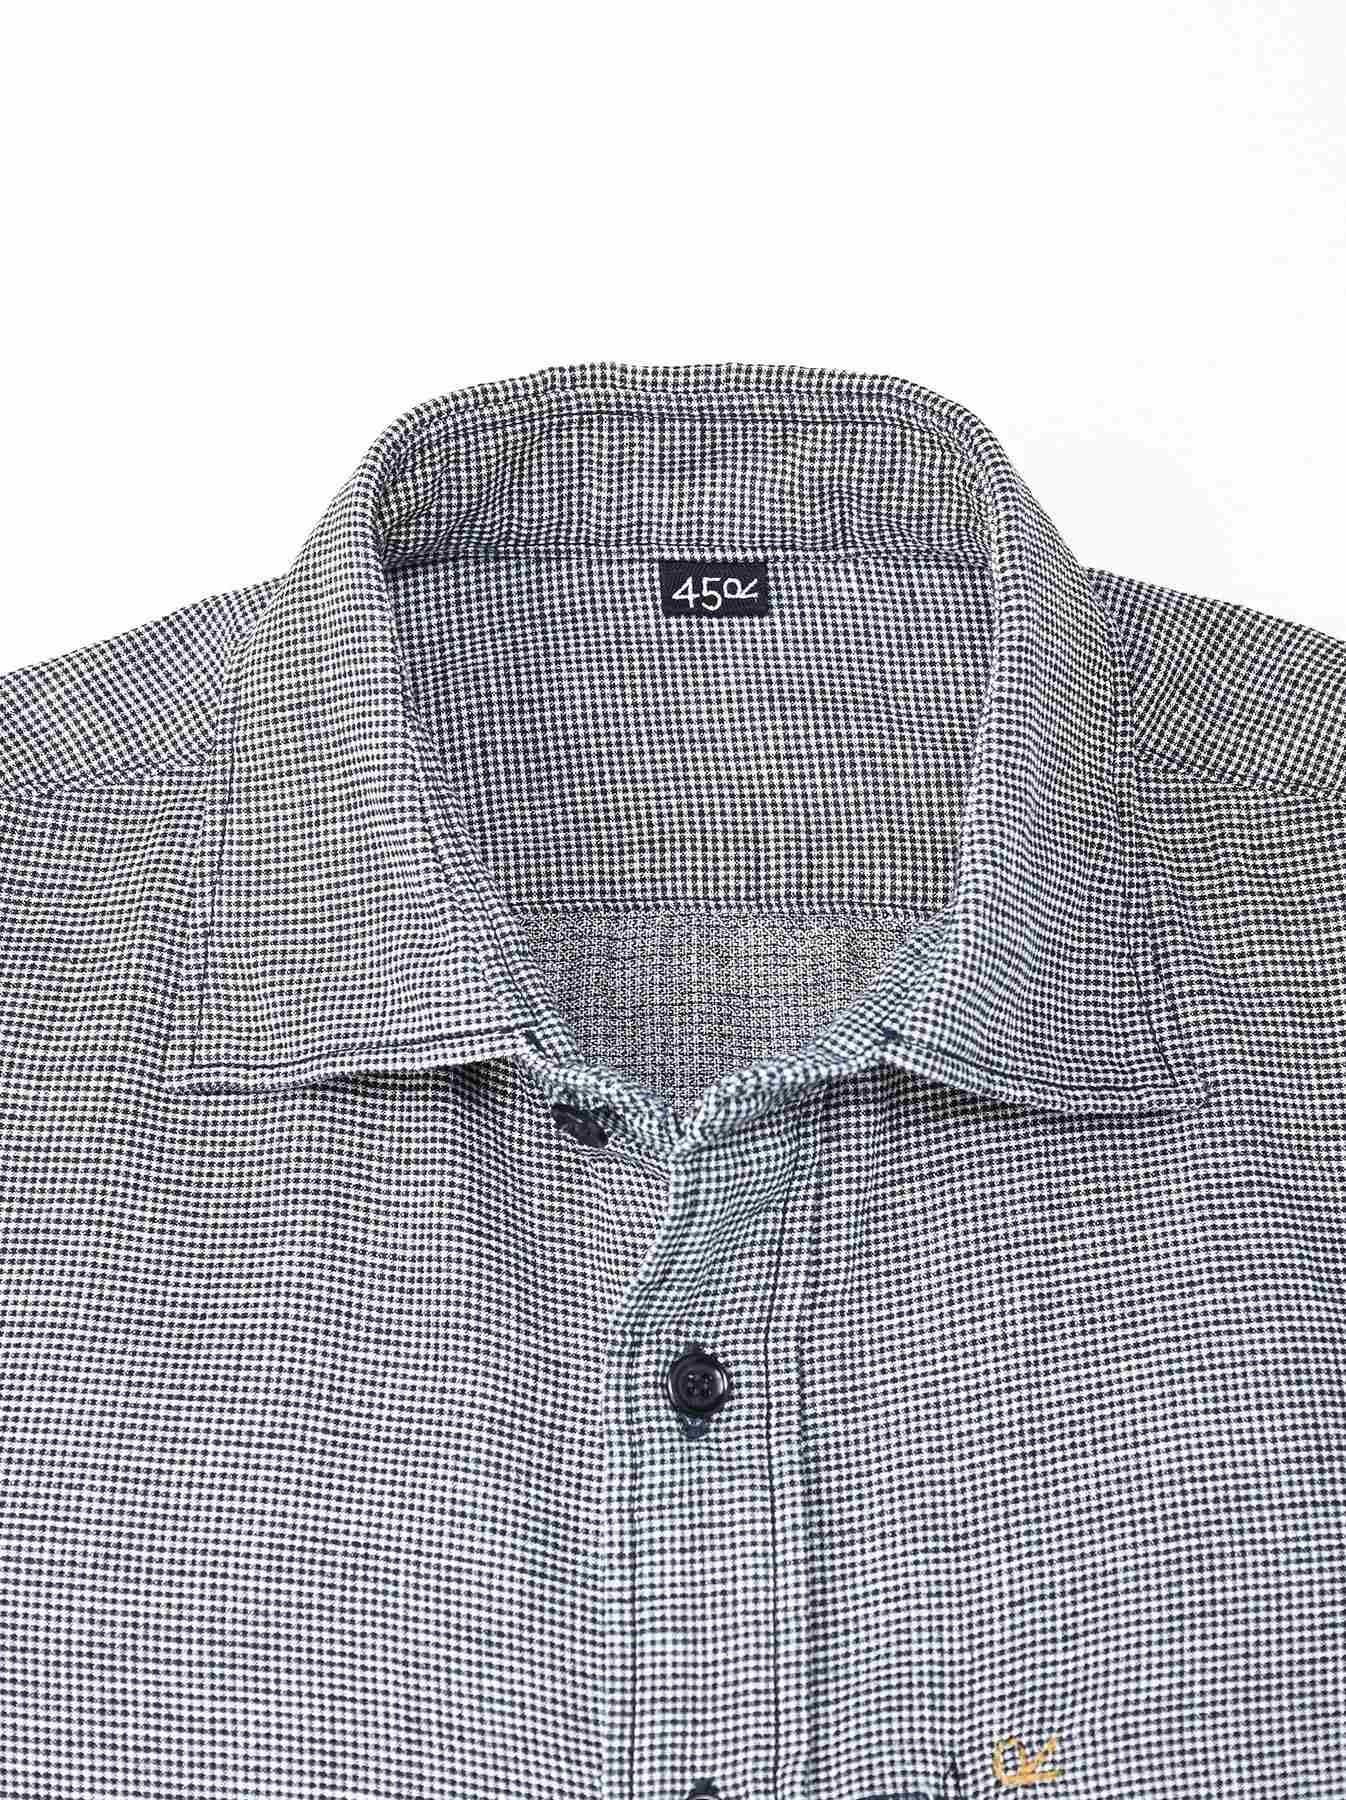 Indigo Double Cloth 908 Regular Shirt-12